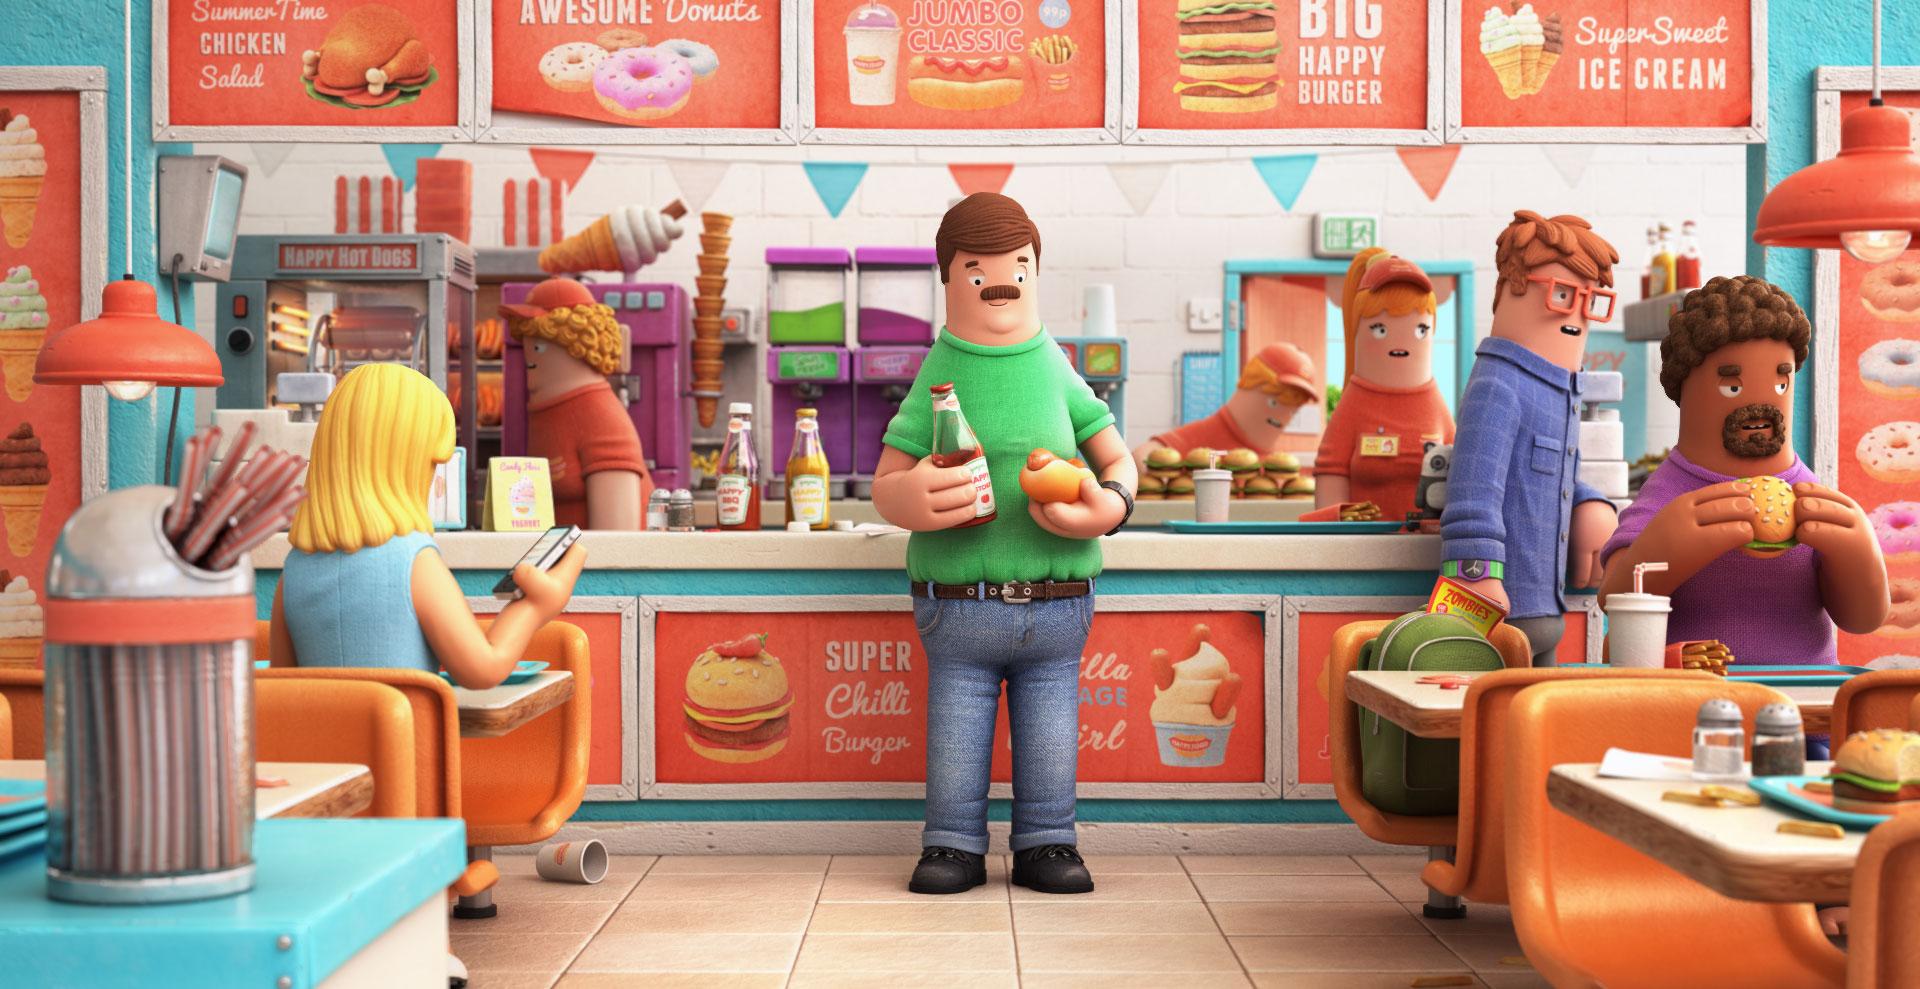 yum-yum-animation-happy-food-bob@1920.jpg